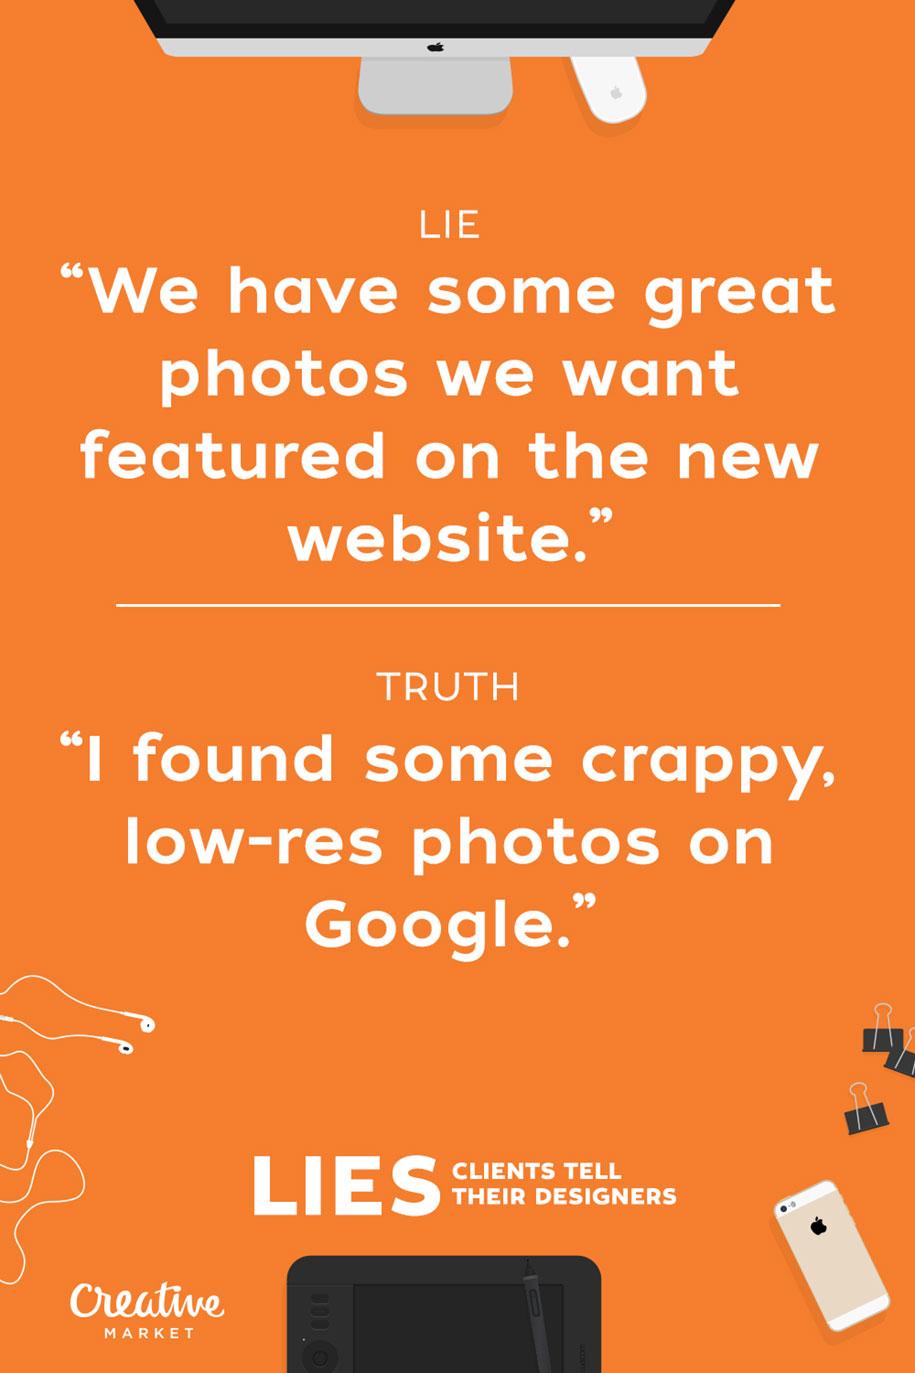 15-lies-clients-tell-designers-joshua-johnson-creative-market-3